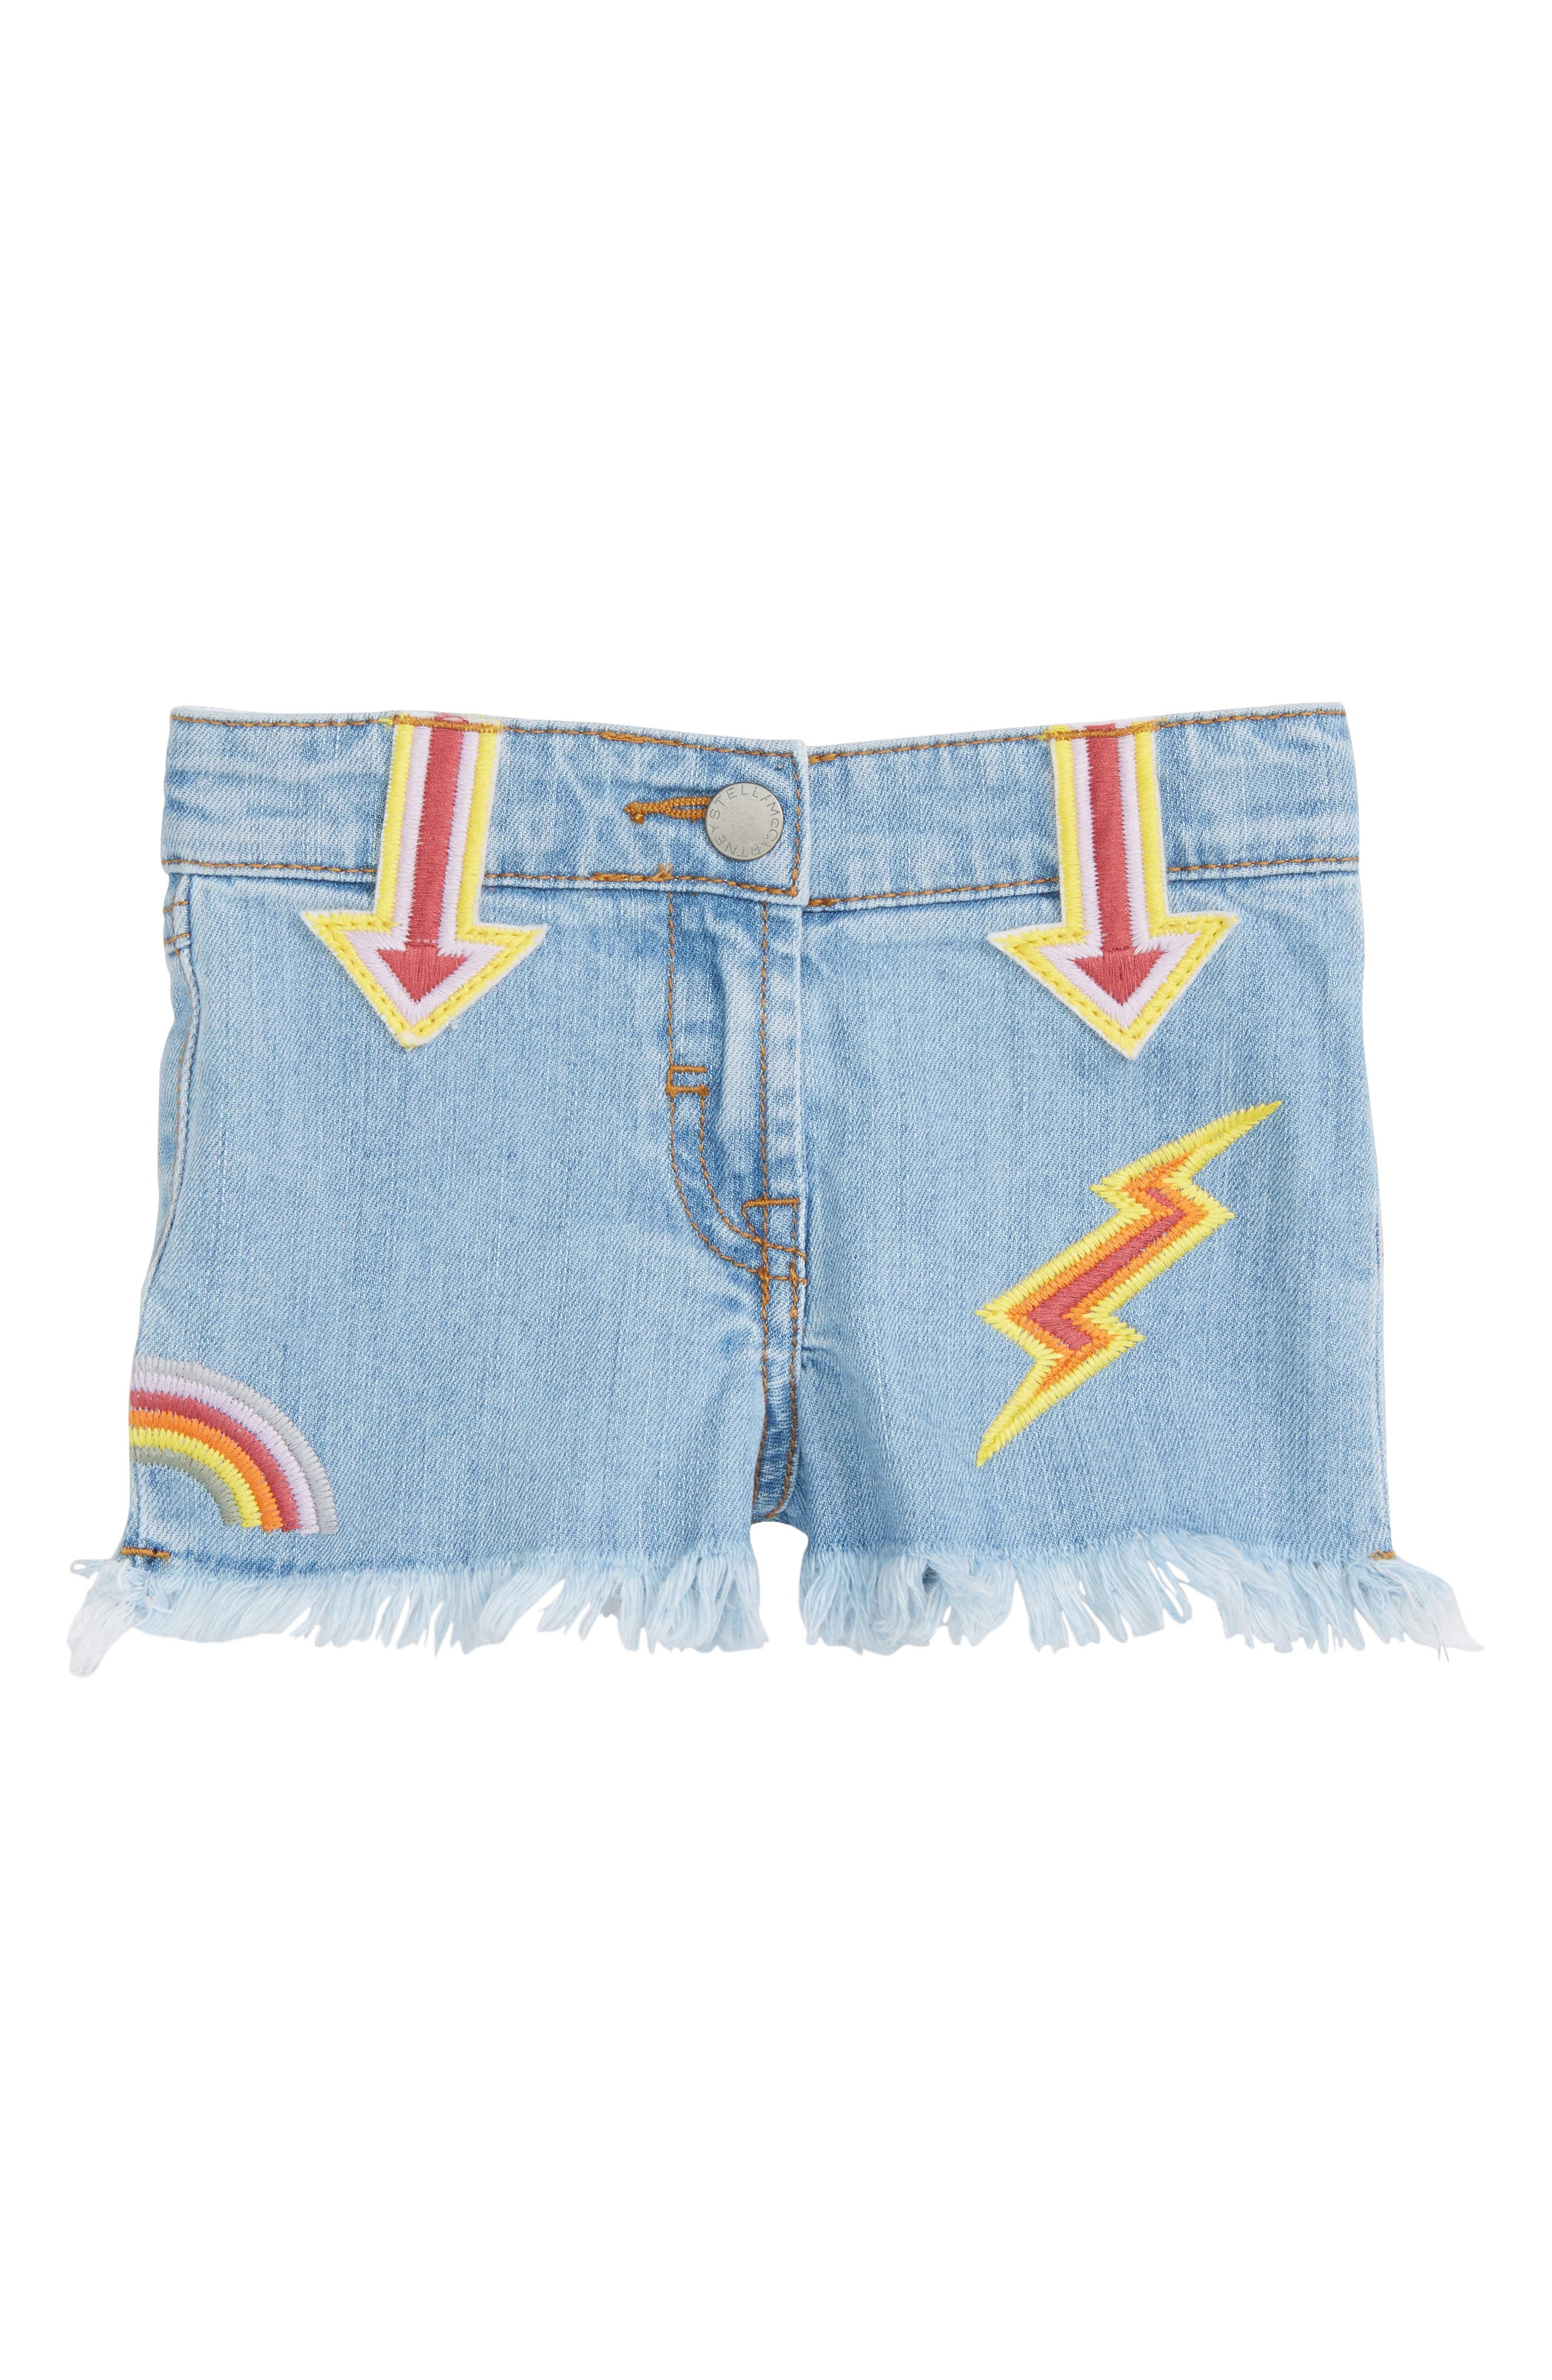 Alternate Image 1 Selected - Stella McCartney Kids Marlin Patched Cutoff Denim Shorts (Toddler Girls, Little Girls & Big Girls)